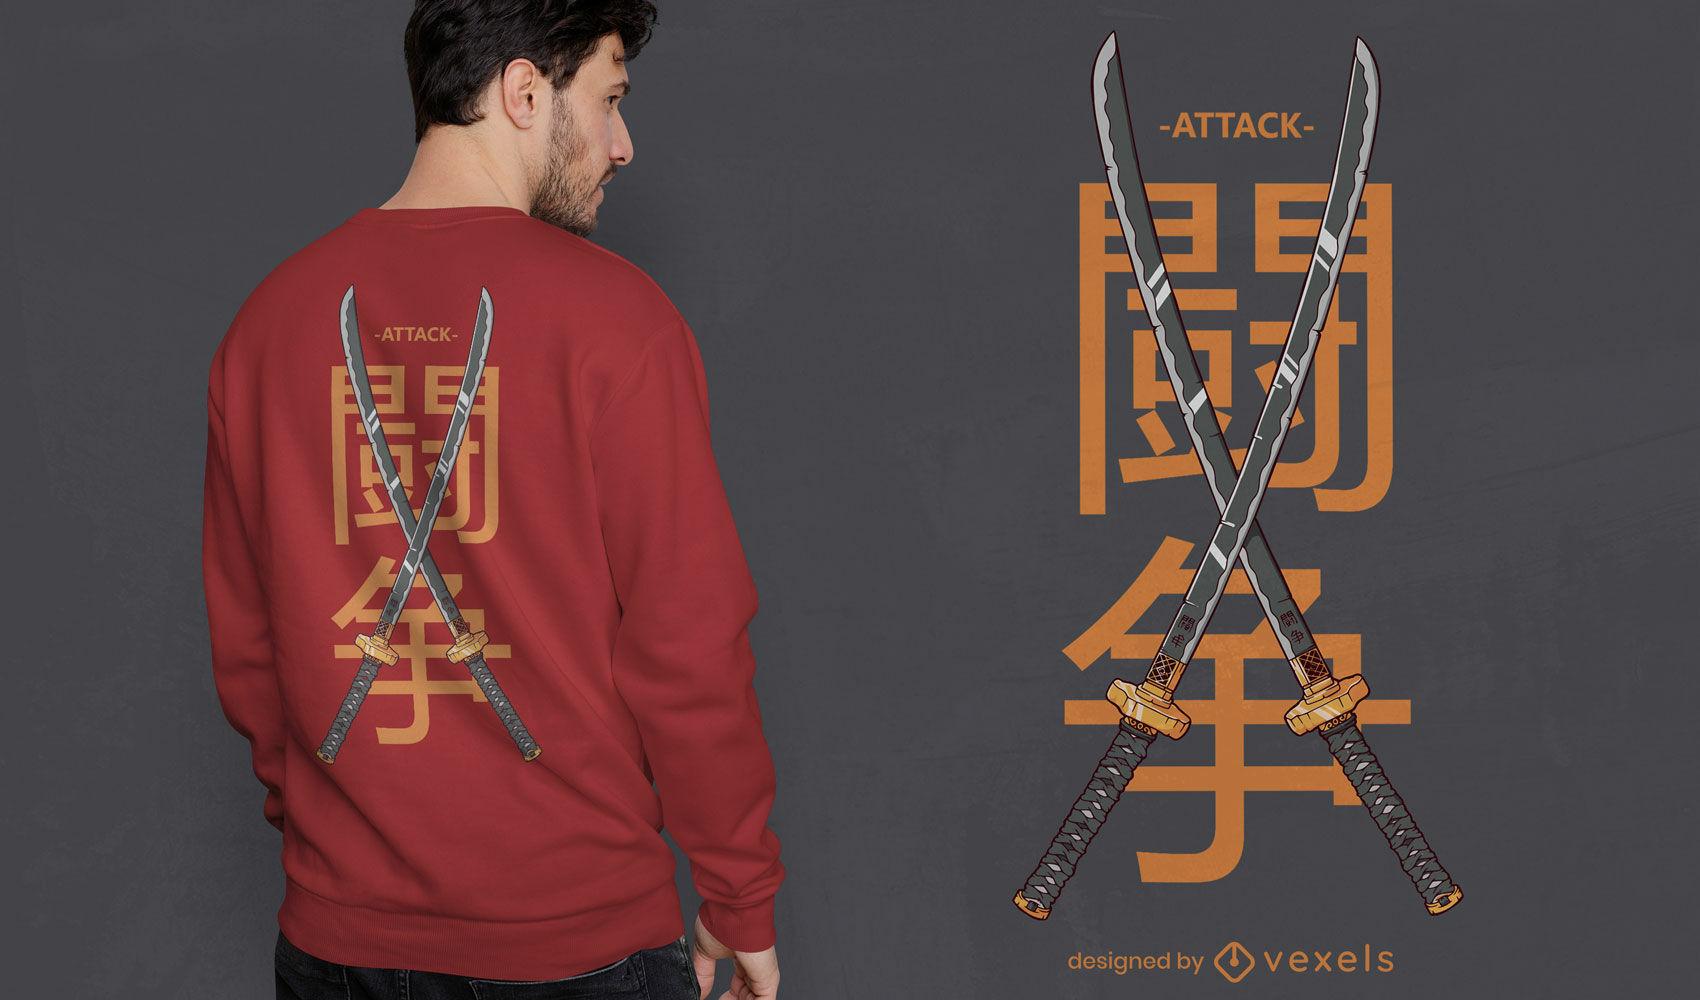 Double japanese swords t-shirt design